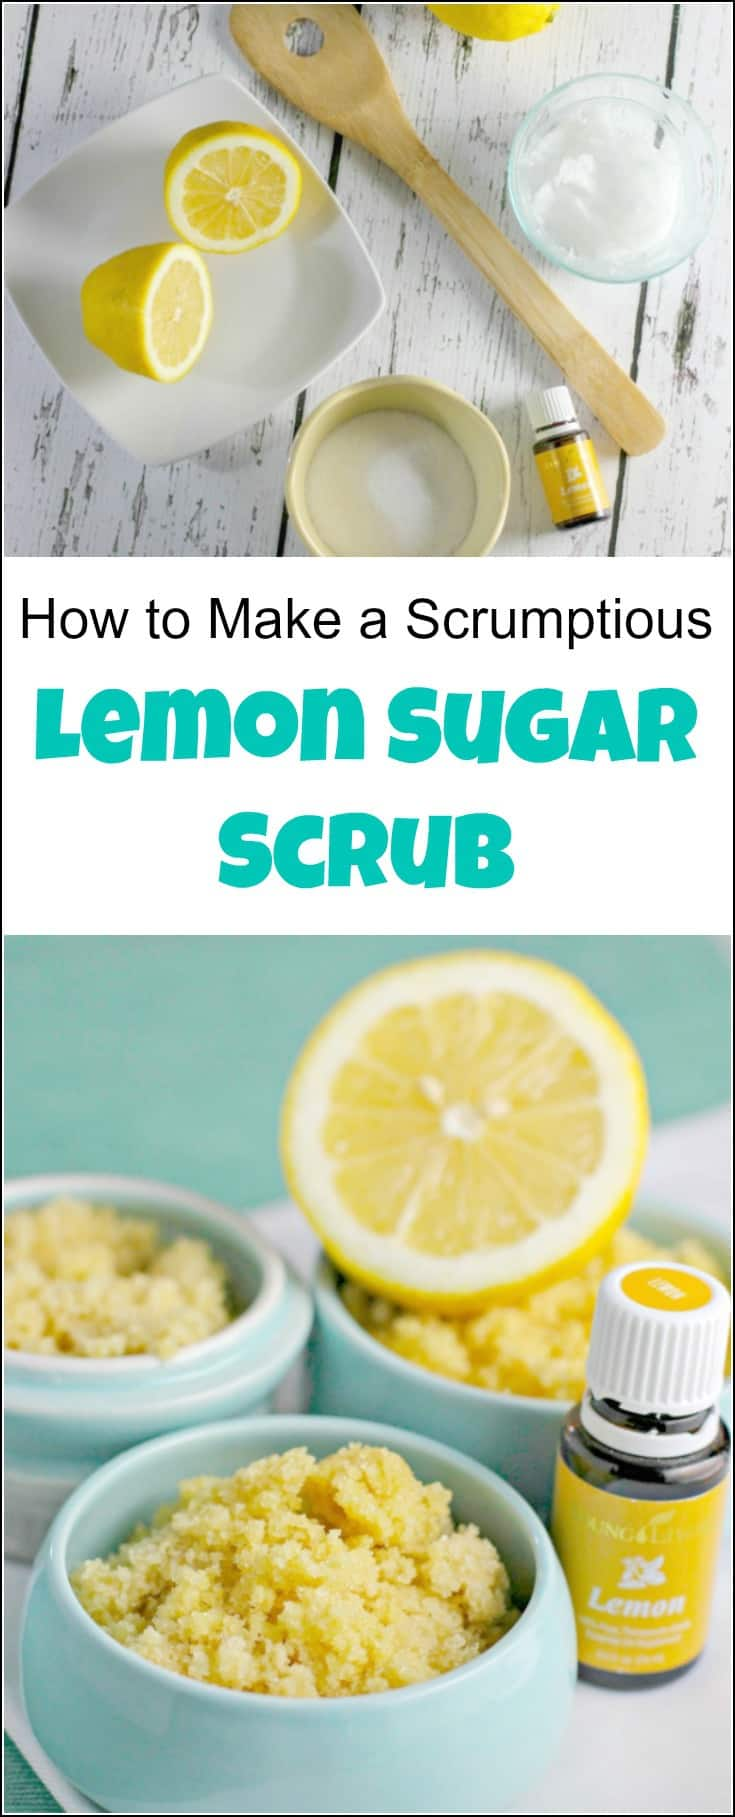 Make this amazing lemon sugar scrub in no time with 3 simple ingredients. This lemon sugar scrub recipe makes the best natural lemon exfoliator. Lemon scrub, sugar and lemon scrub, lemon and sugar, lemon body scrub, lemon sugar face scrub, lemon face scrub, sugar hand scrub, lemon scrub DIY, DIY lemon sugar scrub